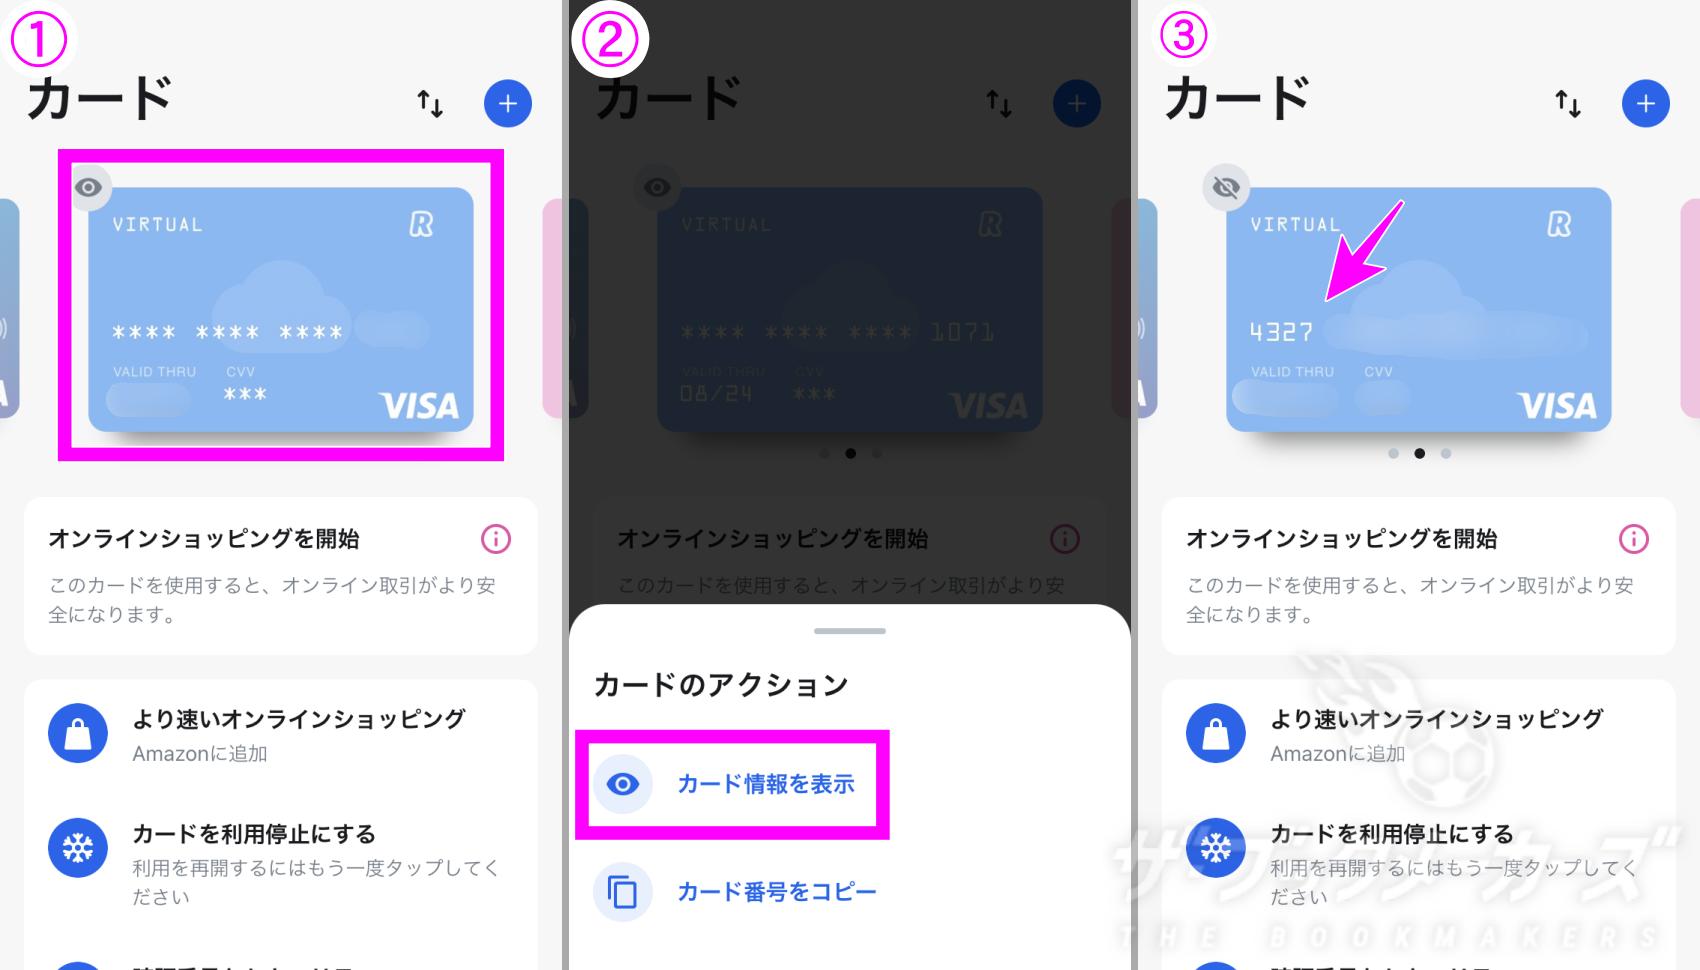 Revolut(レボリュート)バーチャルカードの申し込み方法